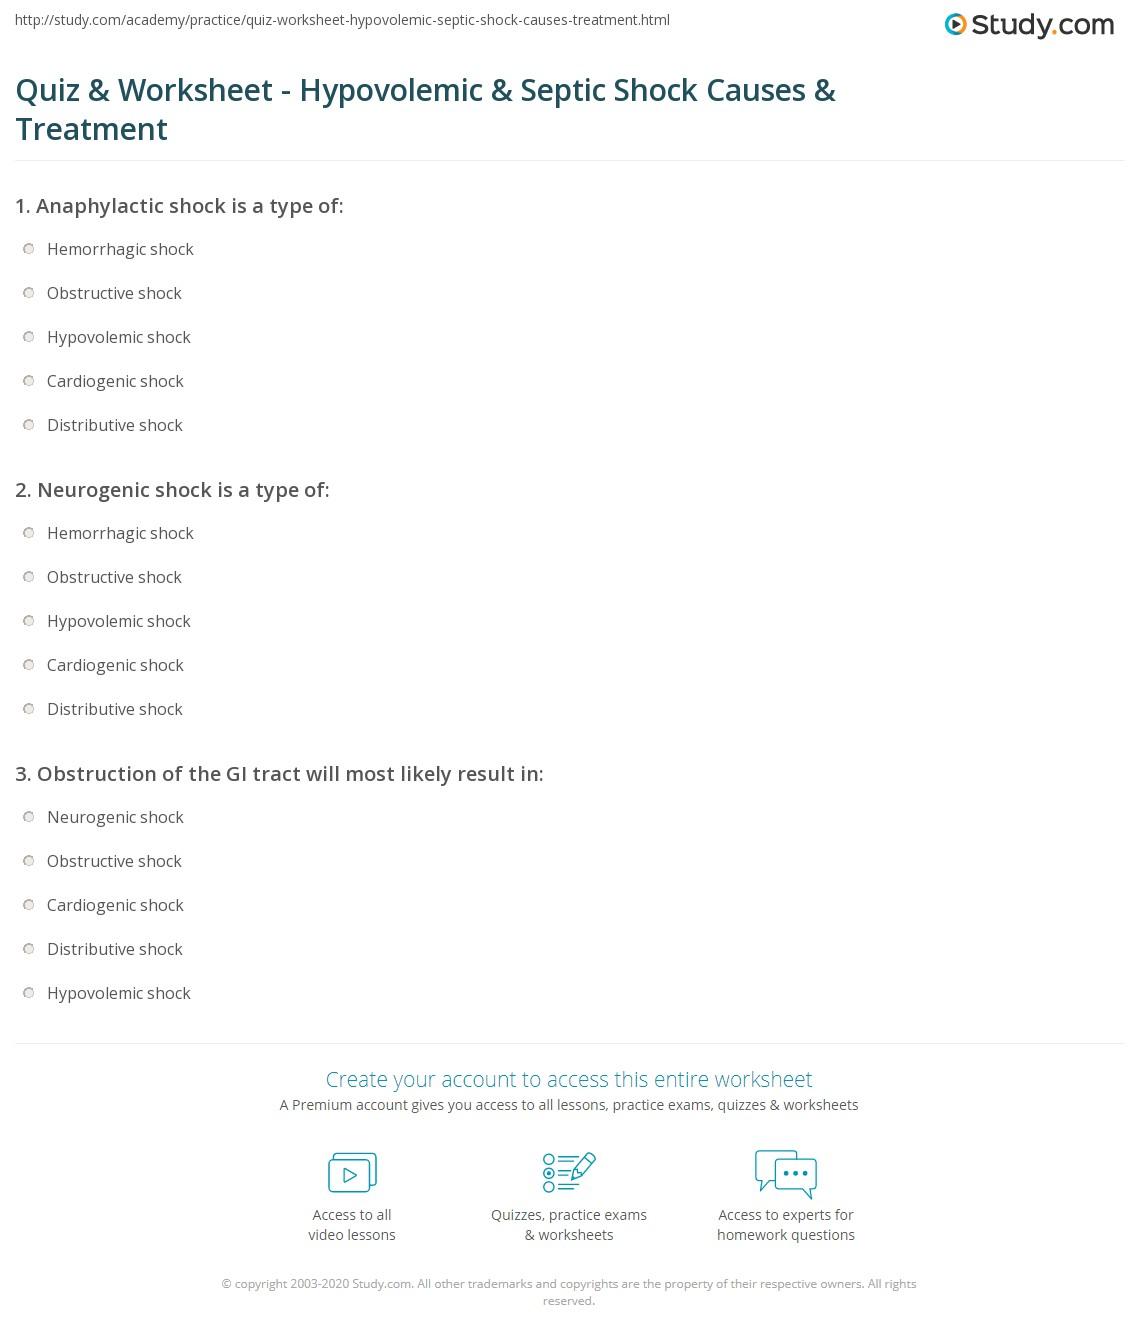 Quiz worksheet hypovolemic septic shock causes treatment print hypovolemic septic shock causes treatment worksheet 1betcityfo Gallery